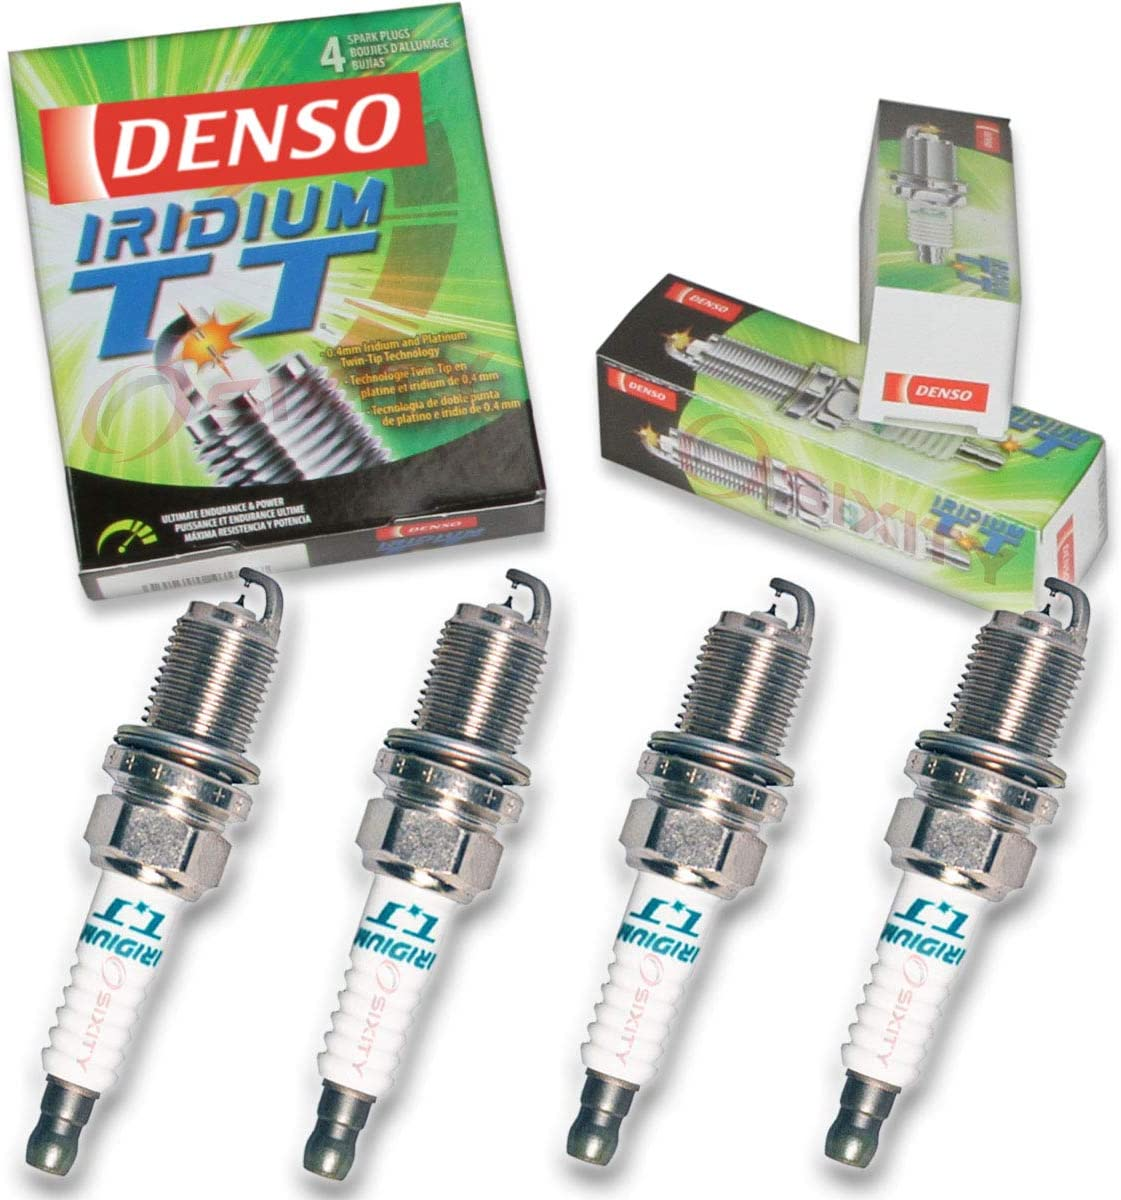 Denso Iridium IKH24 Performance spark plugs x4 Audi VW 1.8 2.0 TFSI TSI EA888